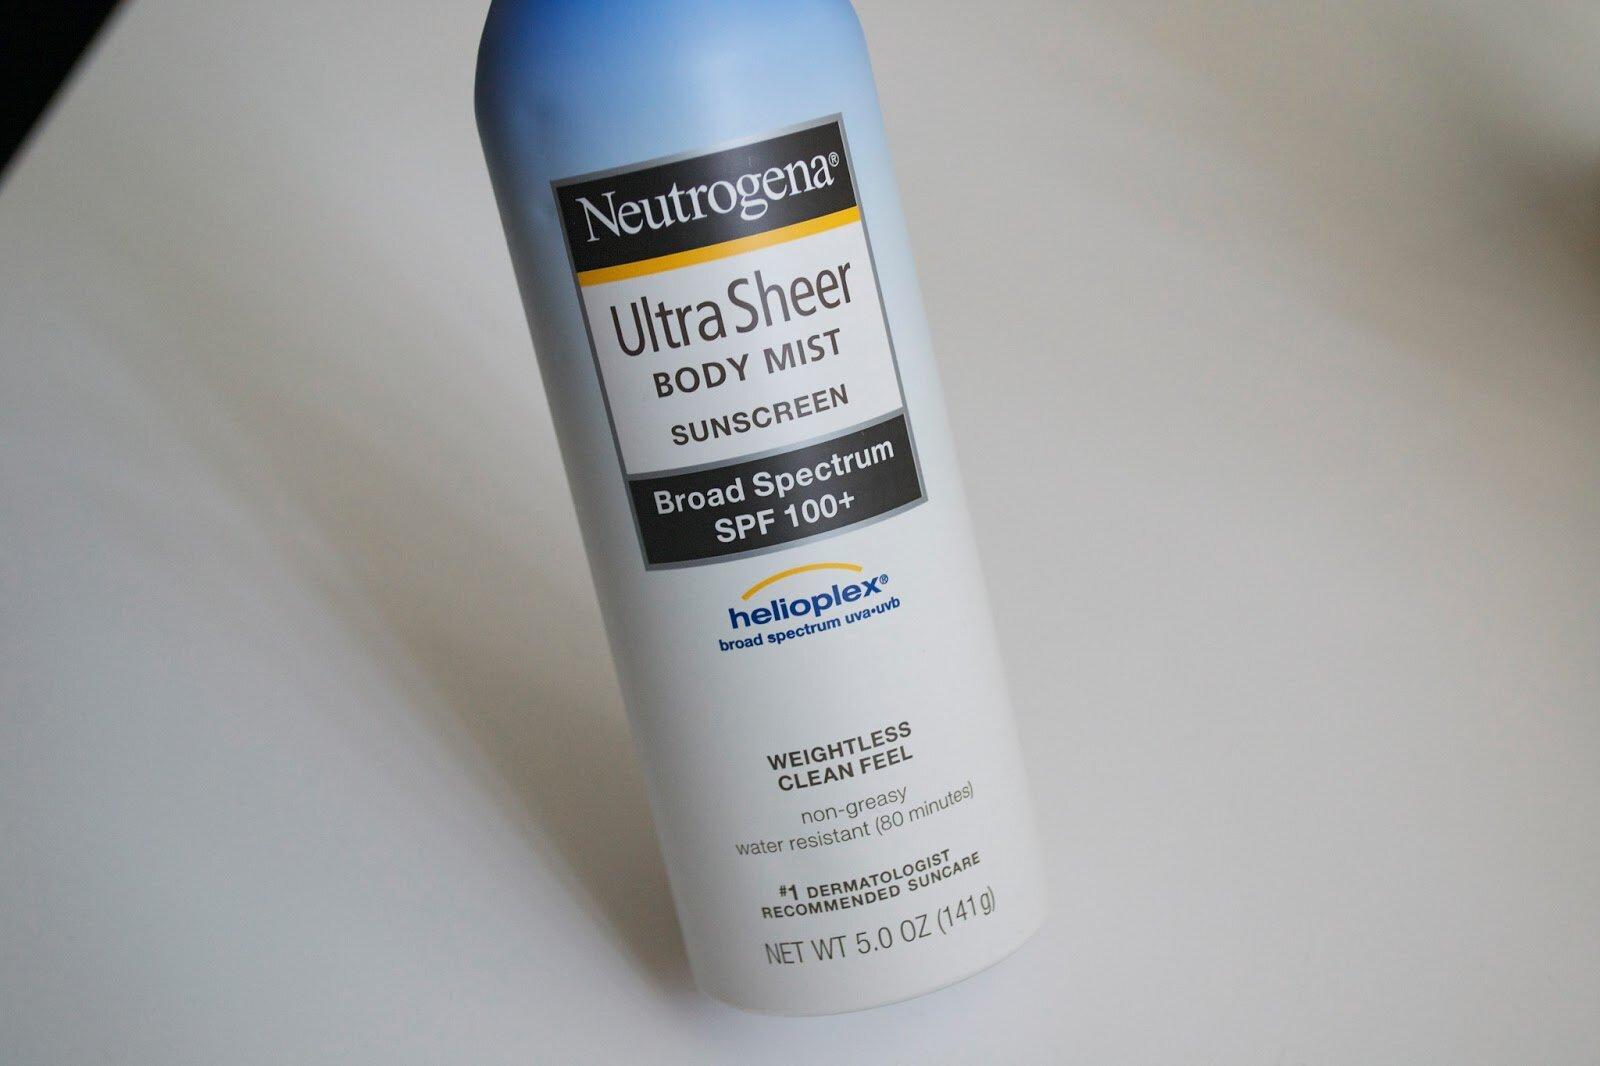 Xịt chống nắng Neutrogena Ultra Sheer Body Mist Sunscreen Boad Spectrum SPF 100+ 141g